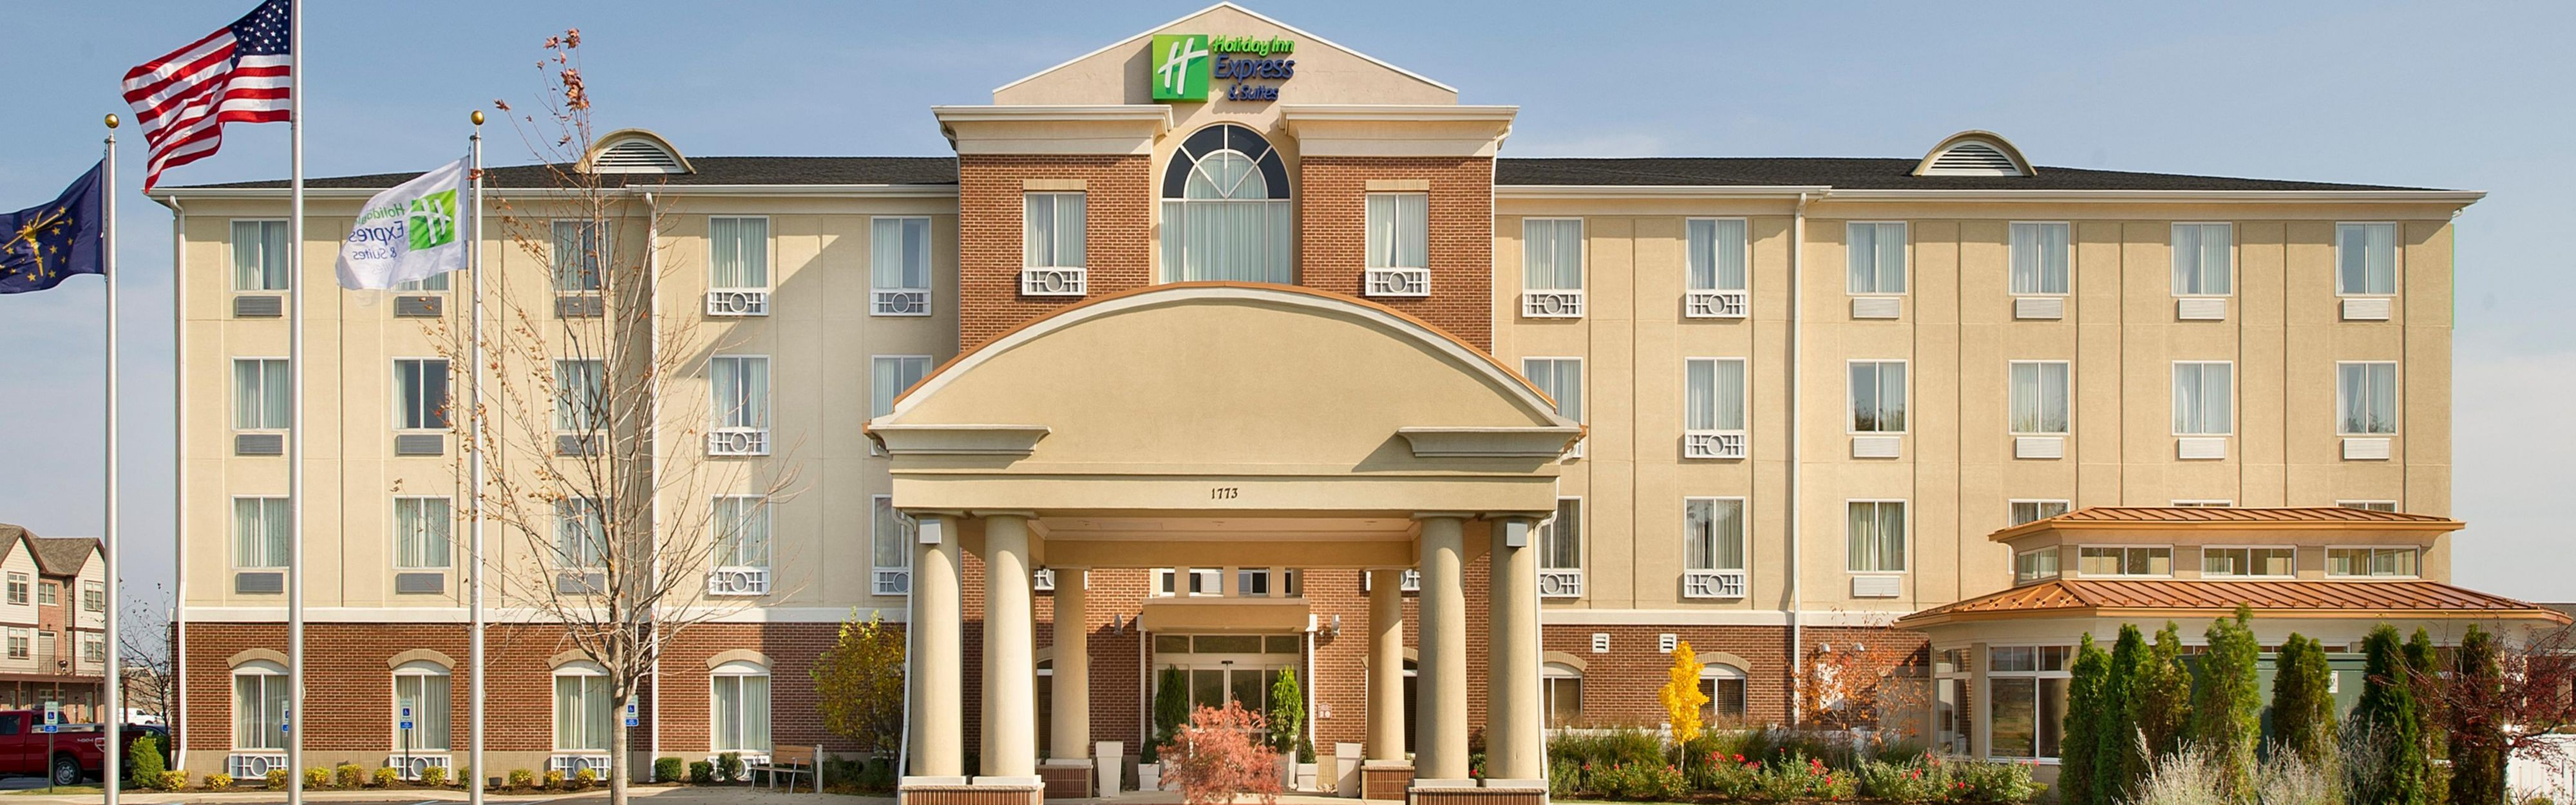 Holiday Inn Express & Suites Schererville image 0